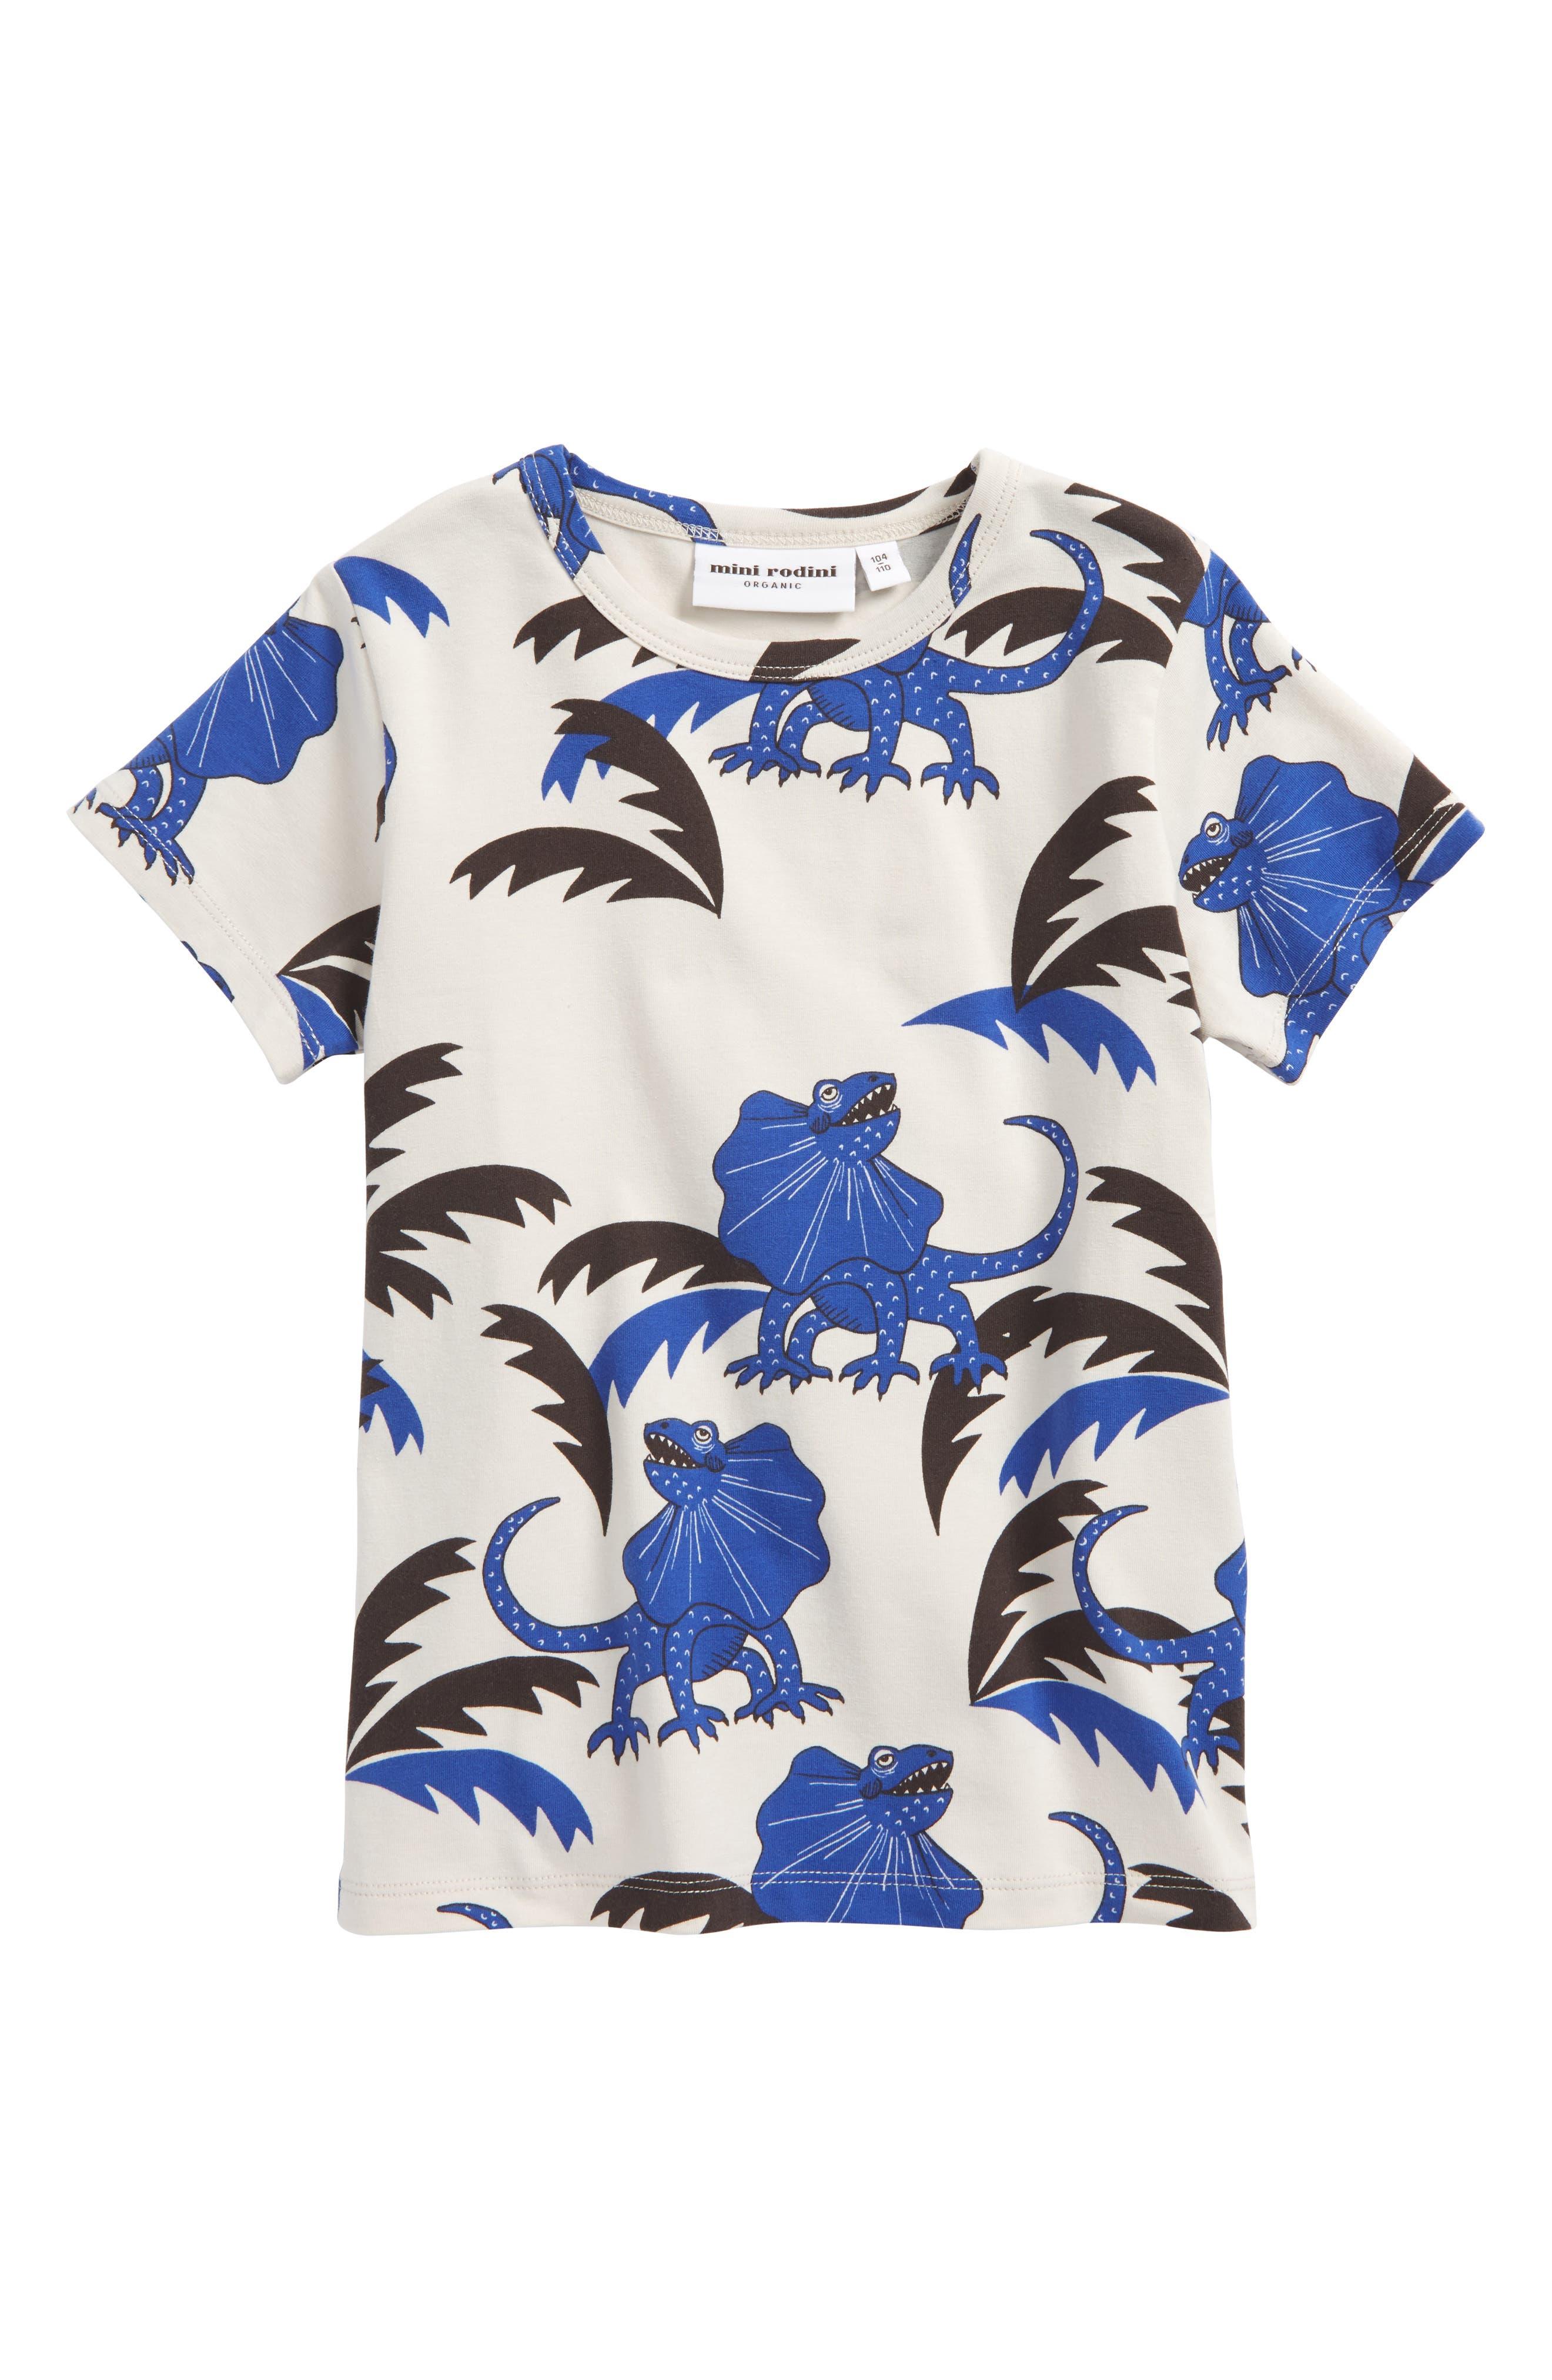 Draco Stretch Organic Cotton T-Shirt,                             Main thumbnail 1, color,                             Blue